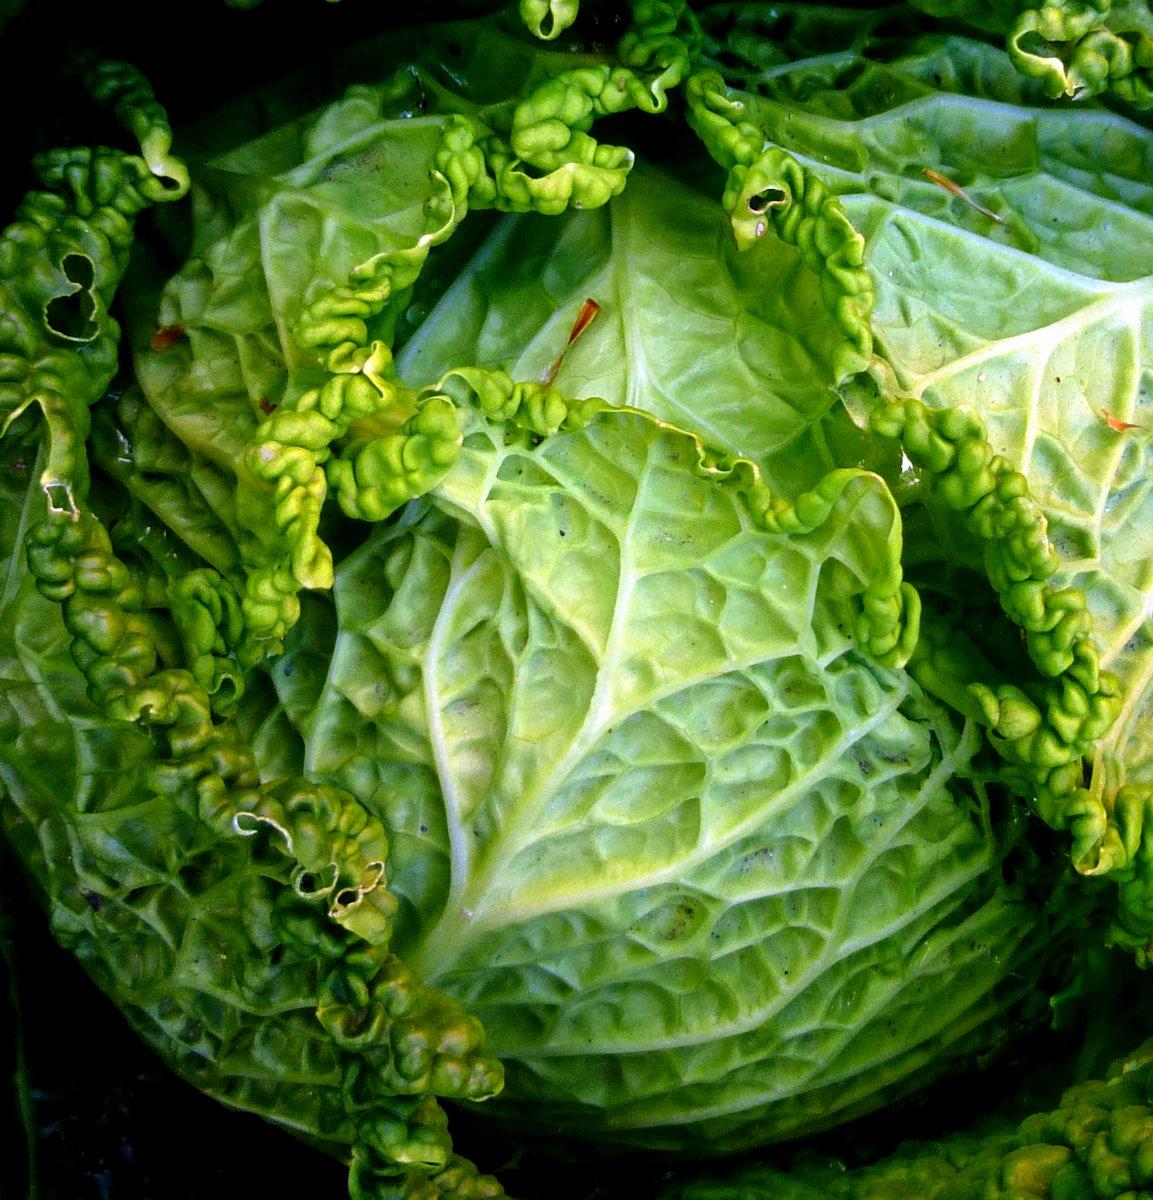 8. Cabbage